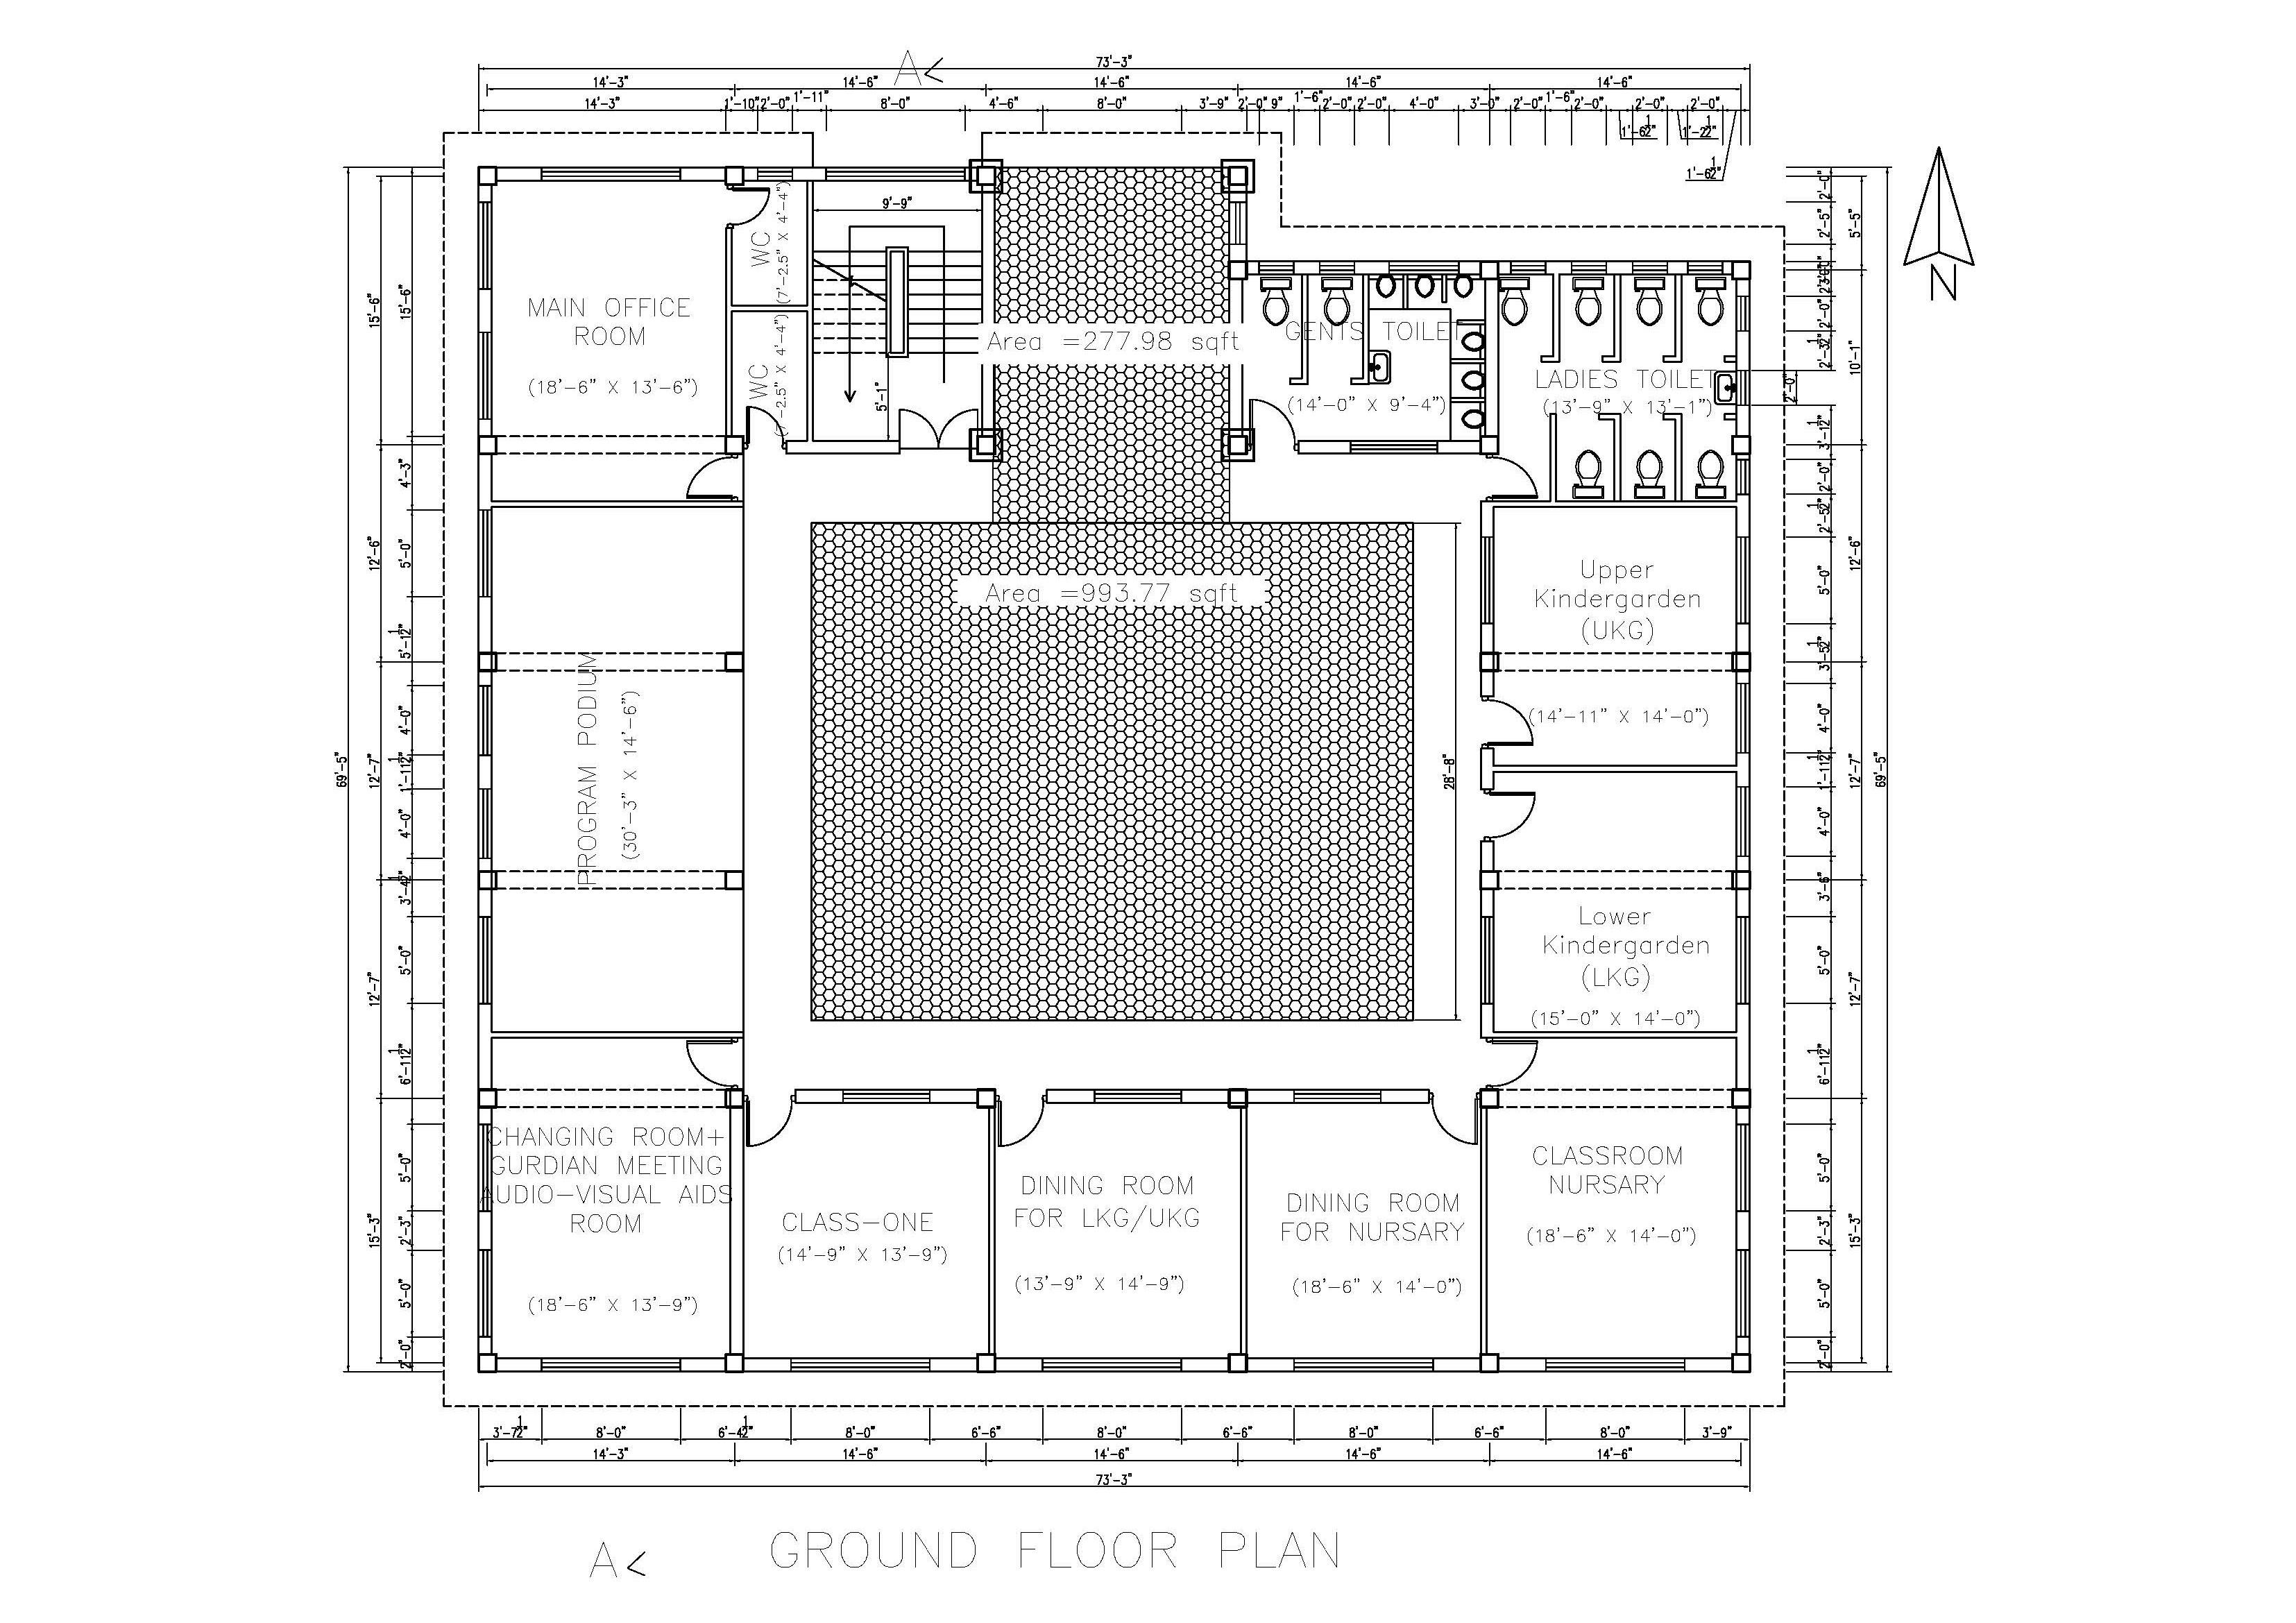 Phulchoki-New-Ground-Floor-Plan_3